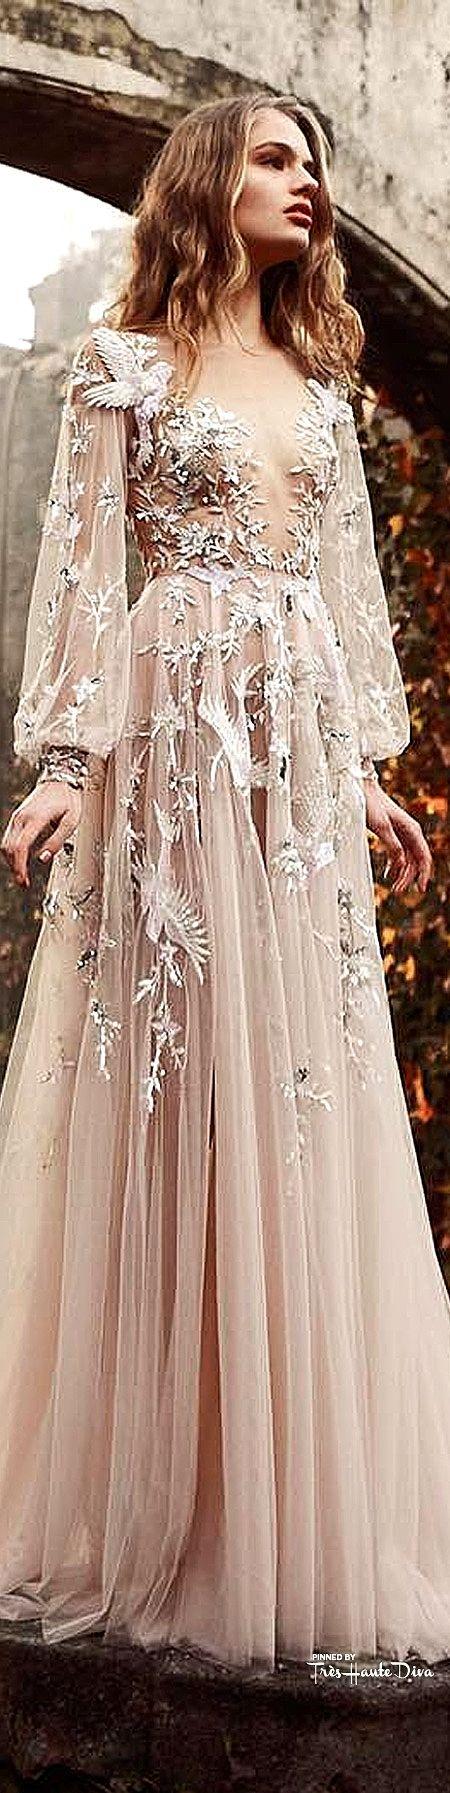 & r a n d o m l o v e l i n e s s ♔ {love lovely loveliness} Très Haute Diva ♔ Paolo Sebastian Couture SS15